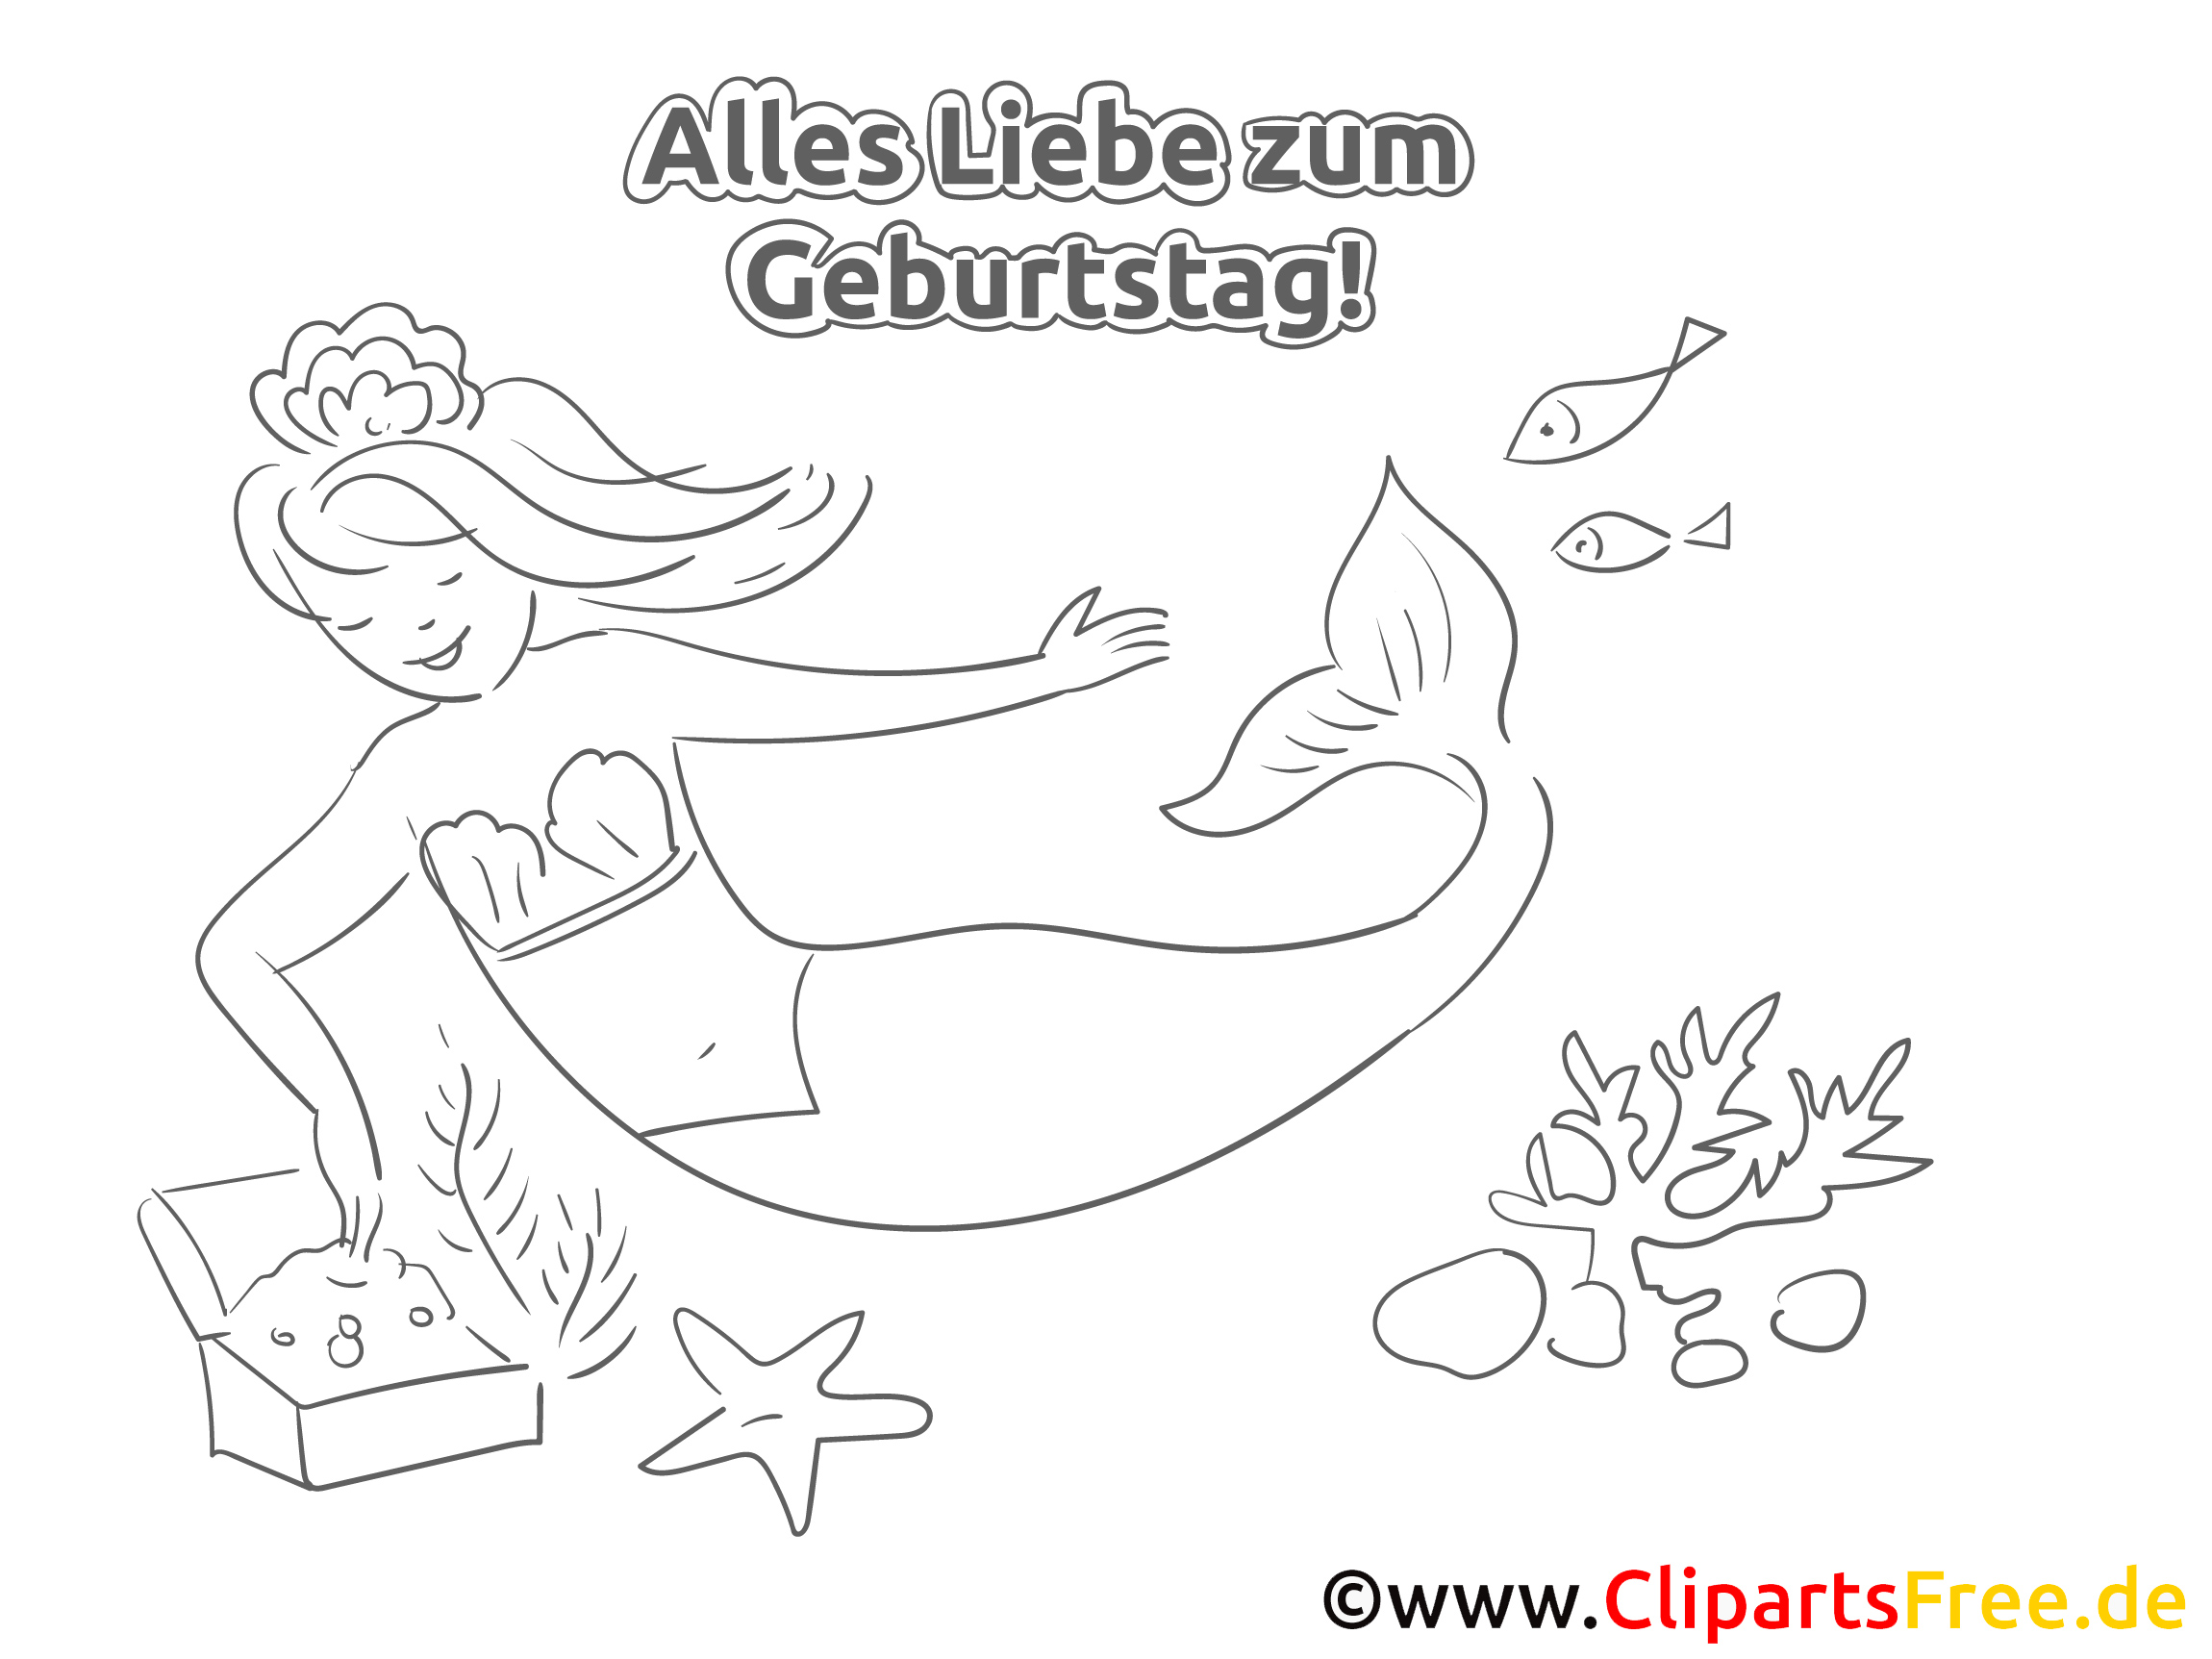 Meerjungfrau Malvorlage zum Geburtstag